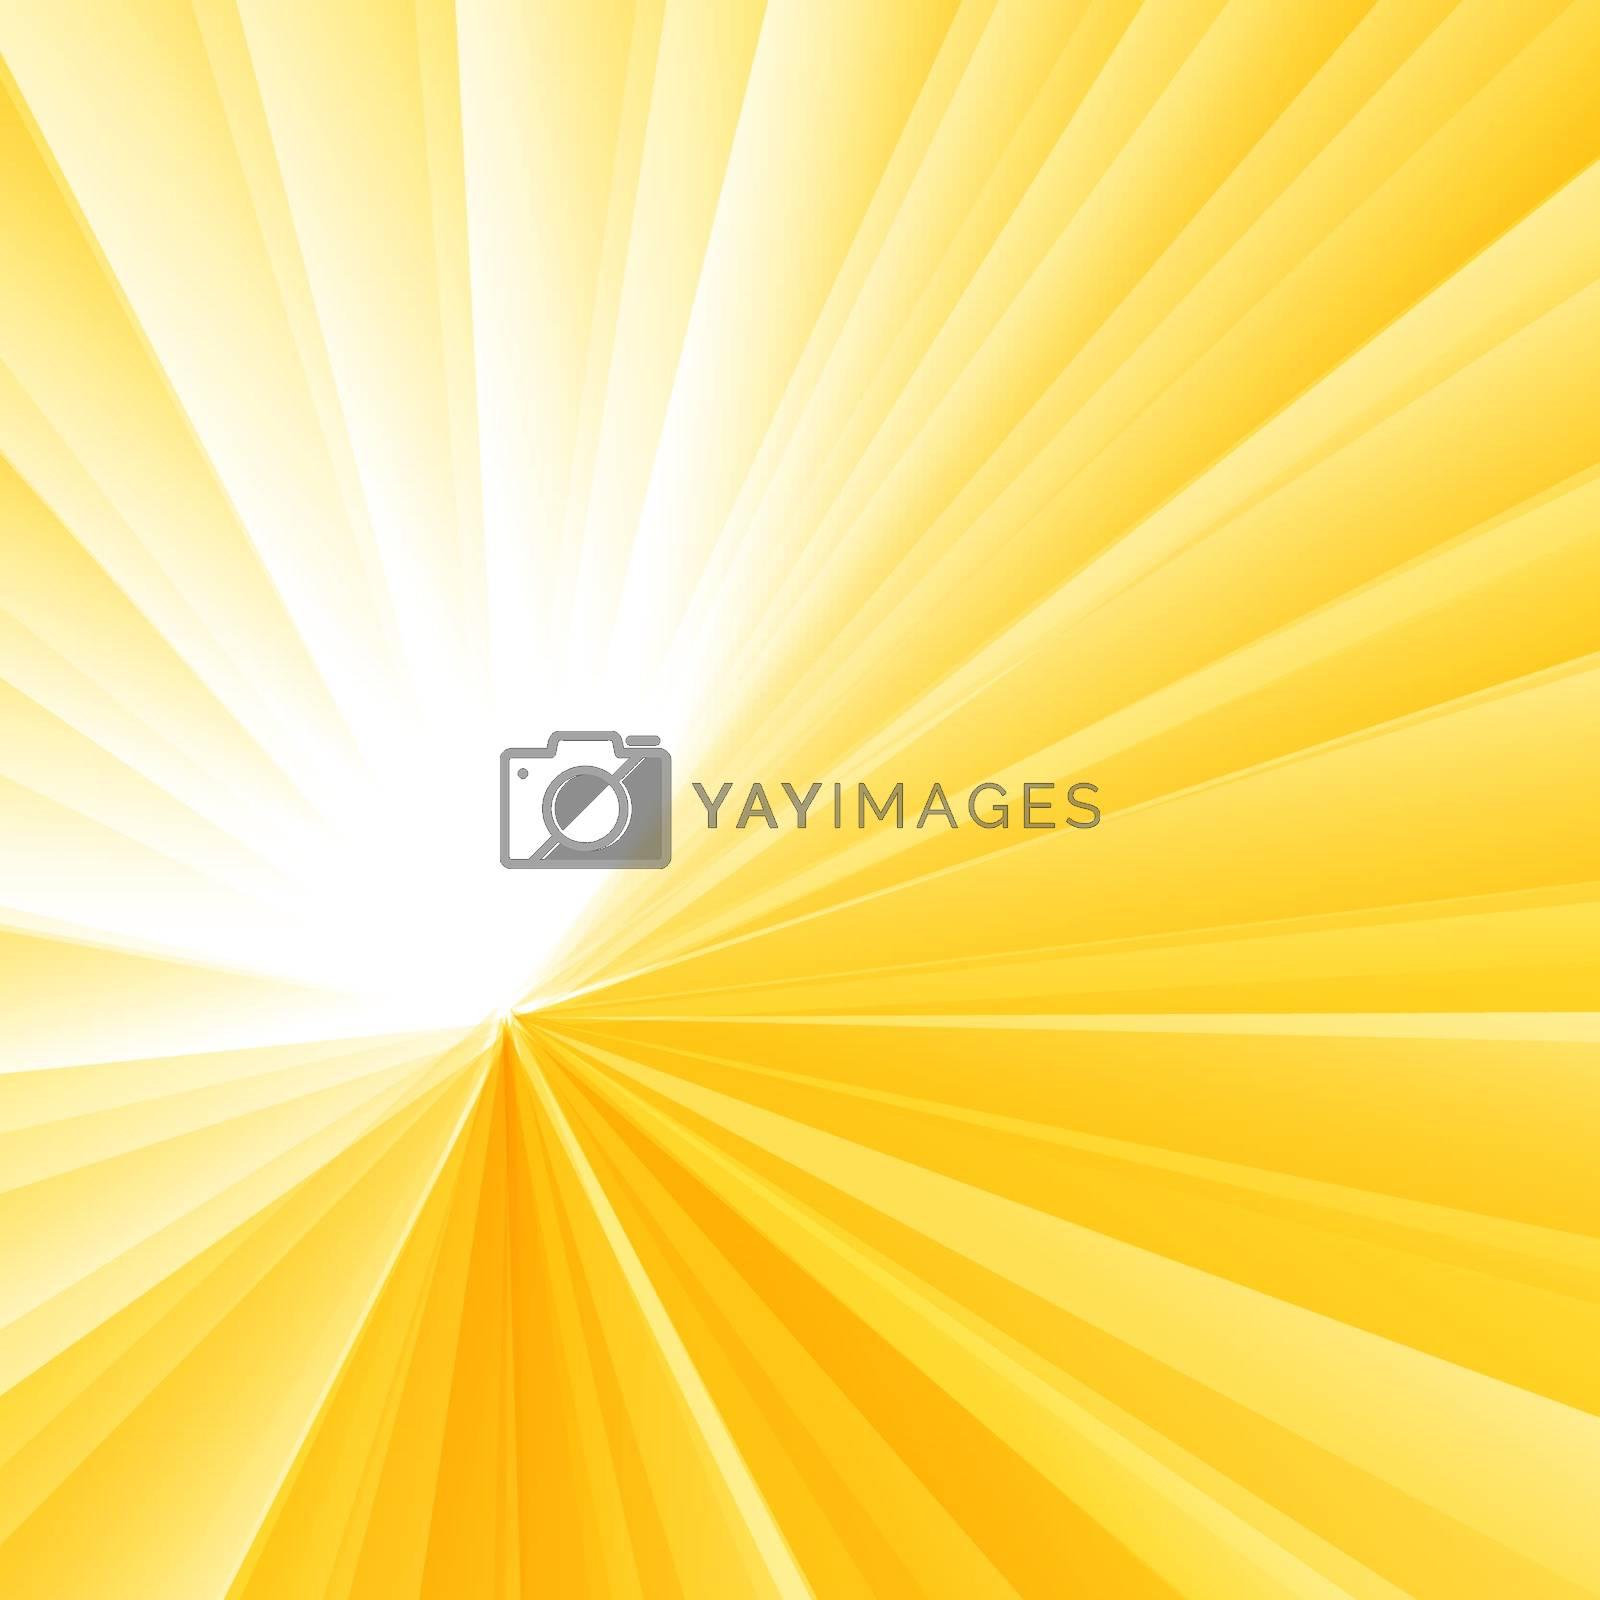 Abstract light burst yellow radial gradient background. Sunburst rays pattern. Vector illustration